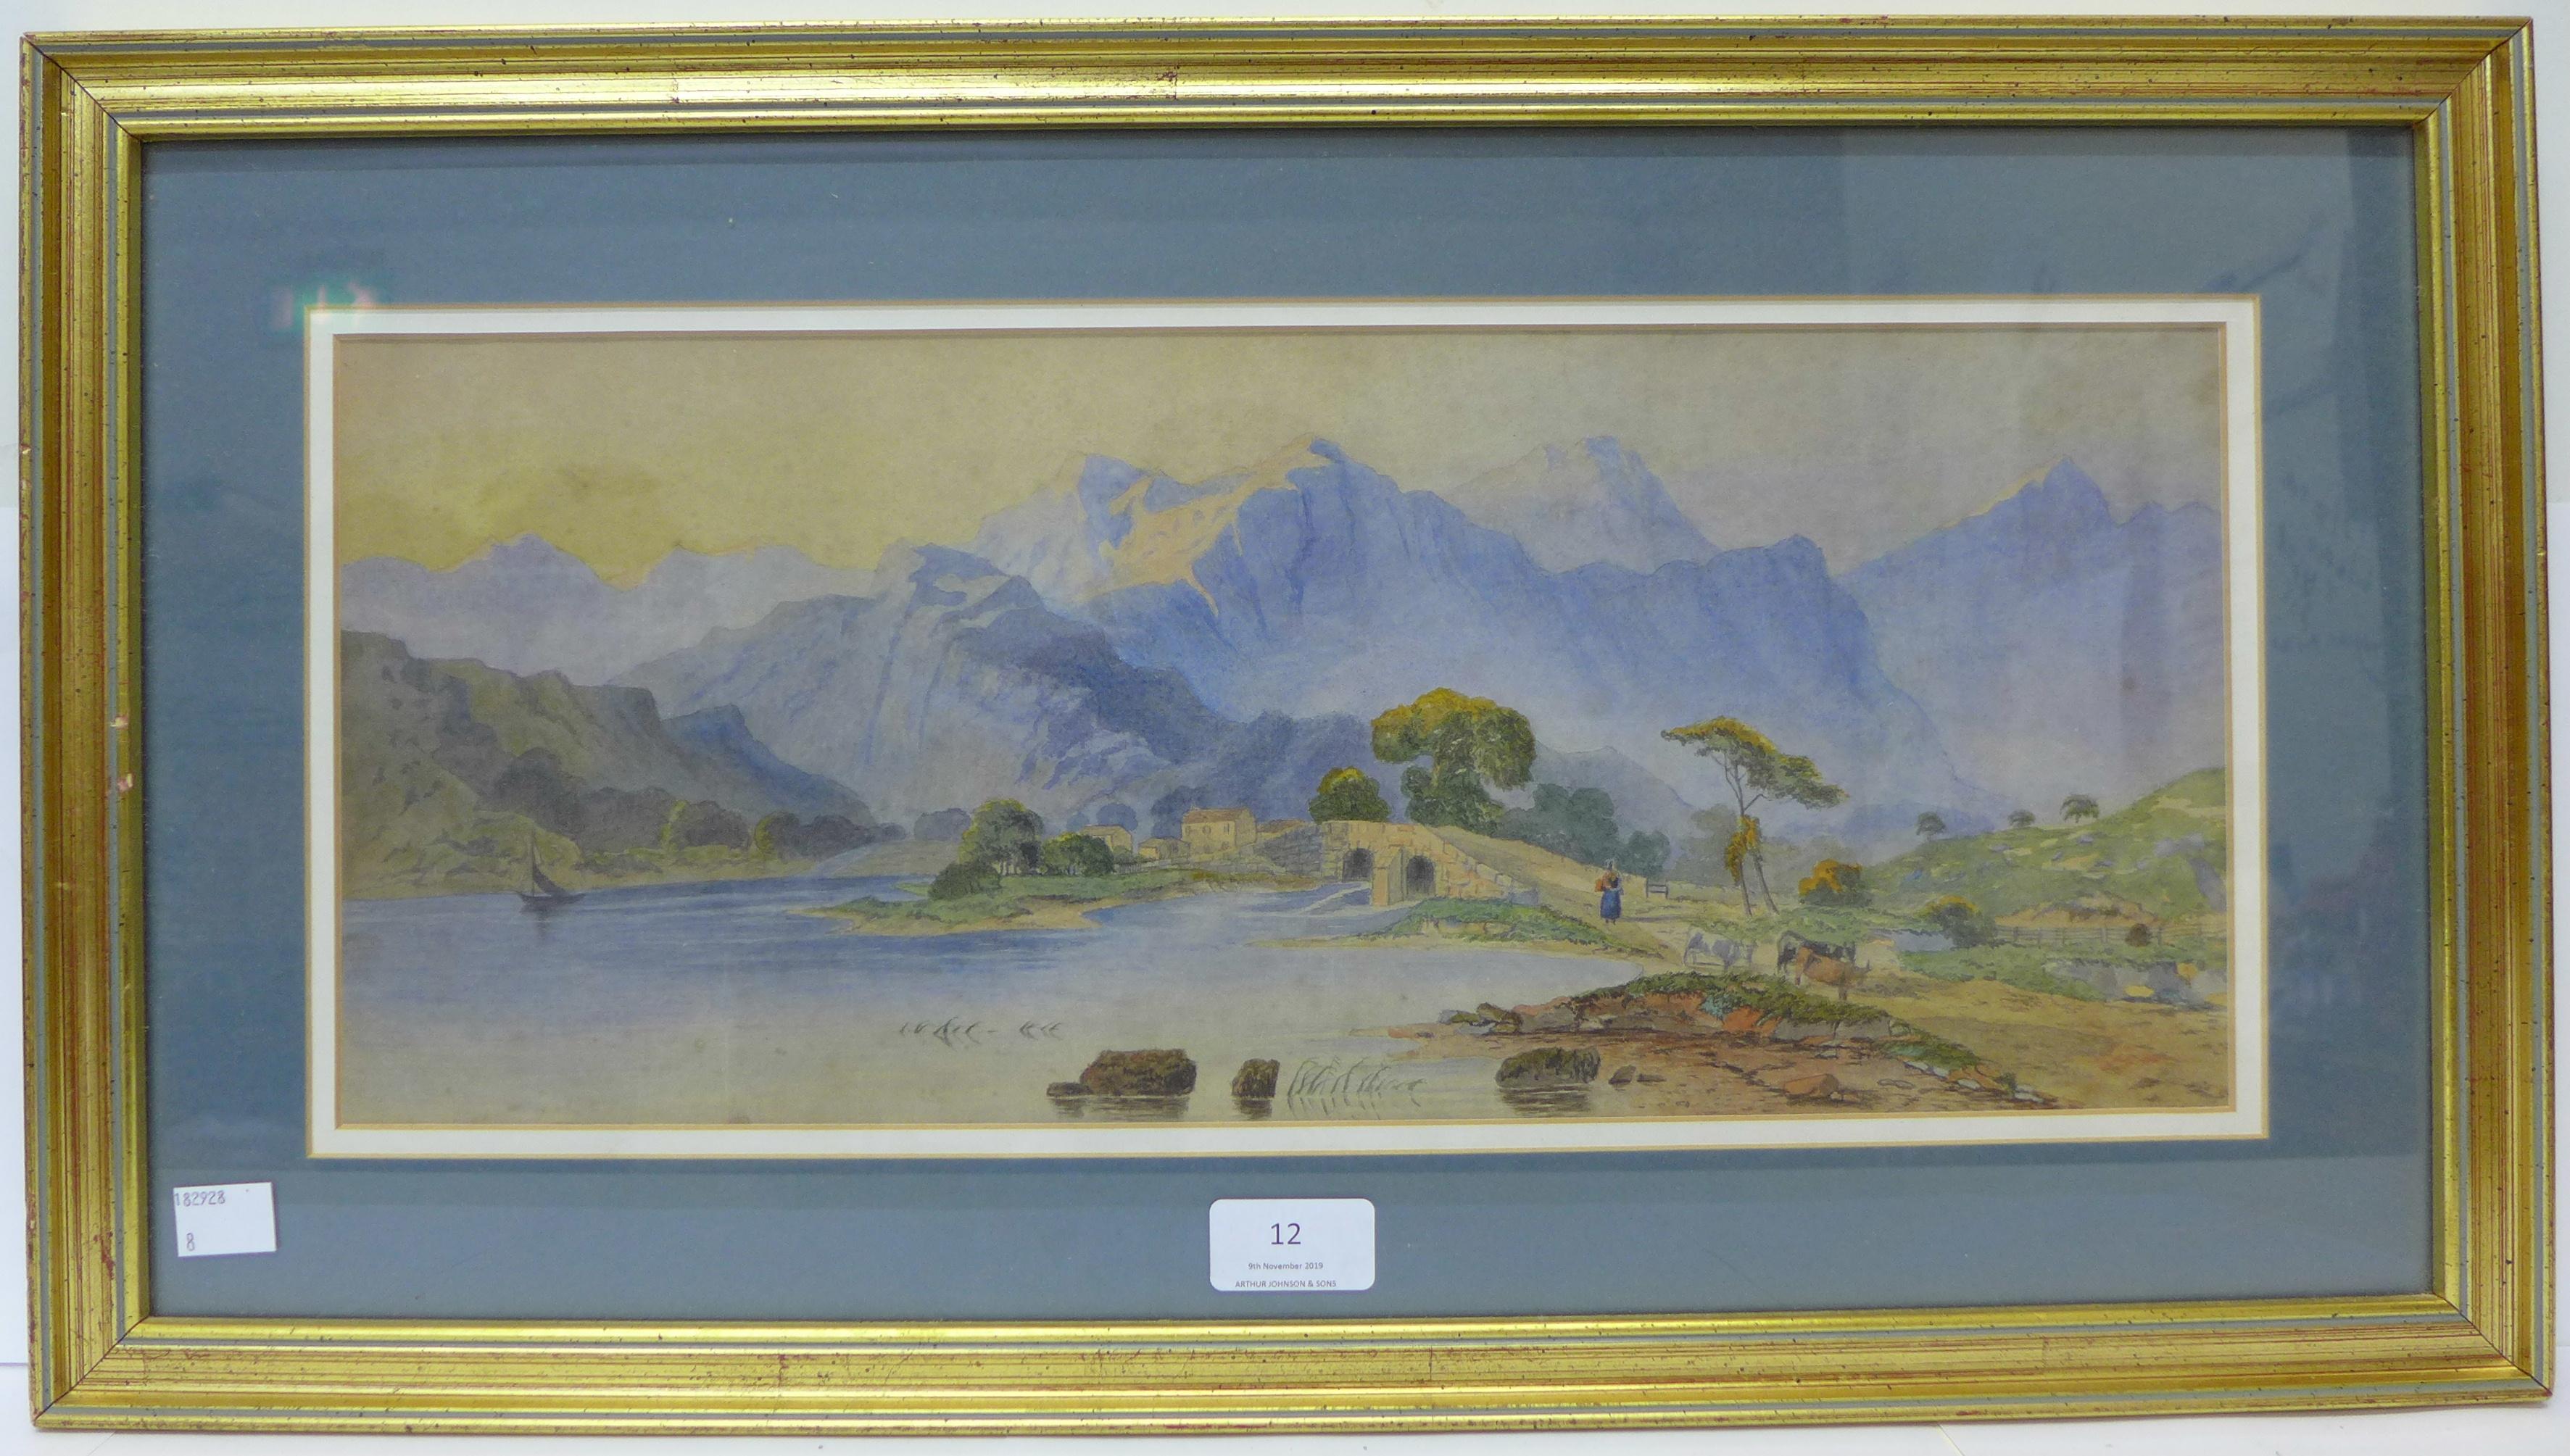 Continental School, Alpine landscape, watercolour, 18 x 44cms, - Image 2 of 2